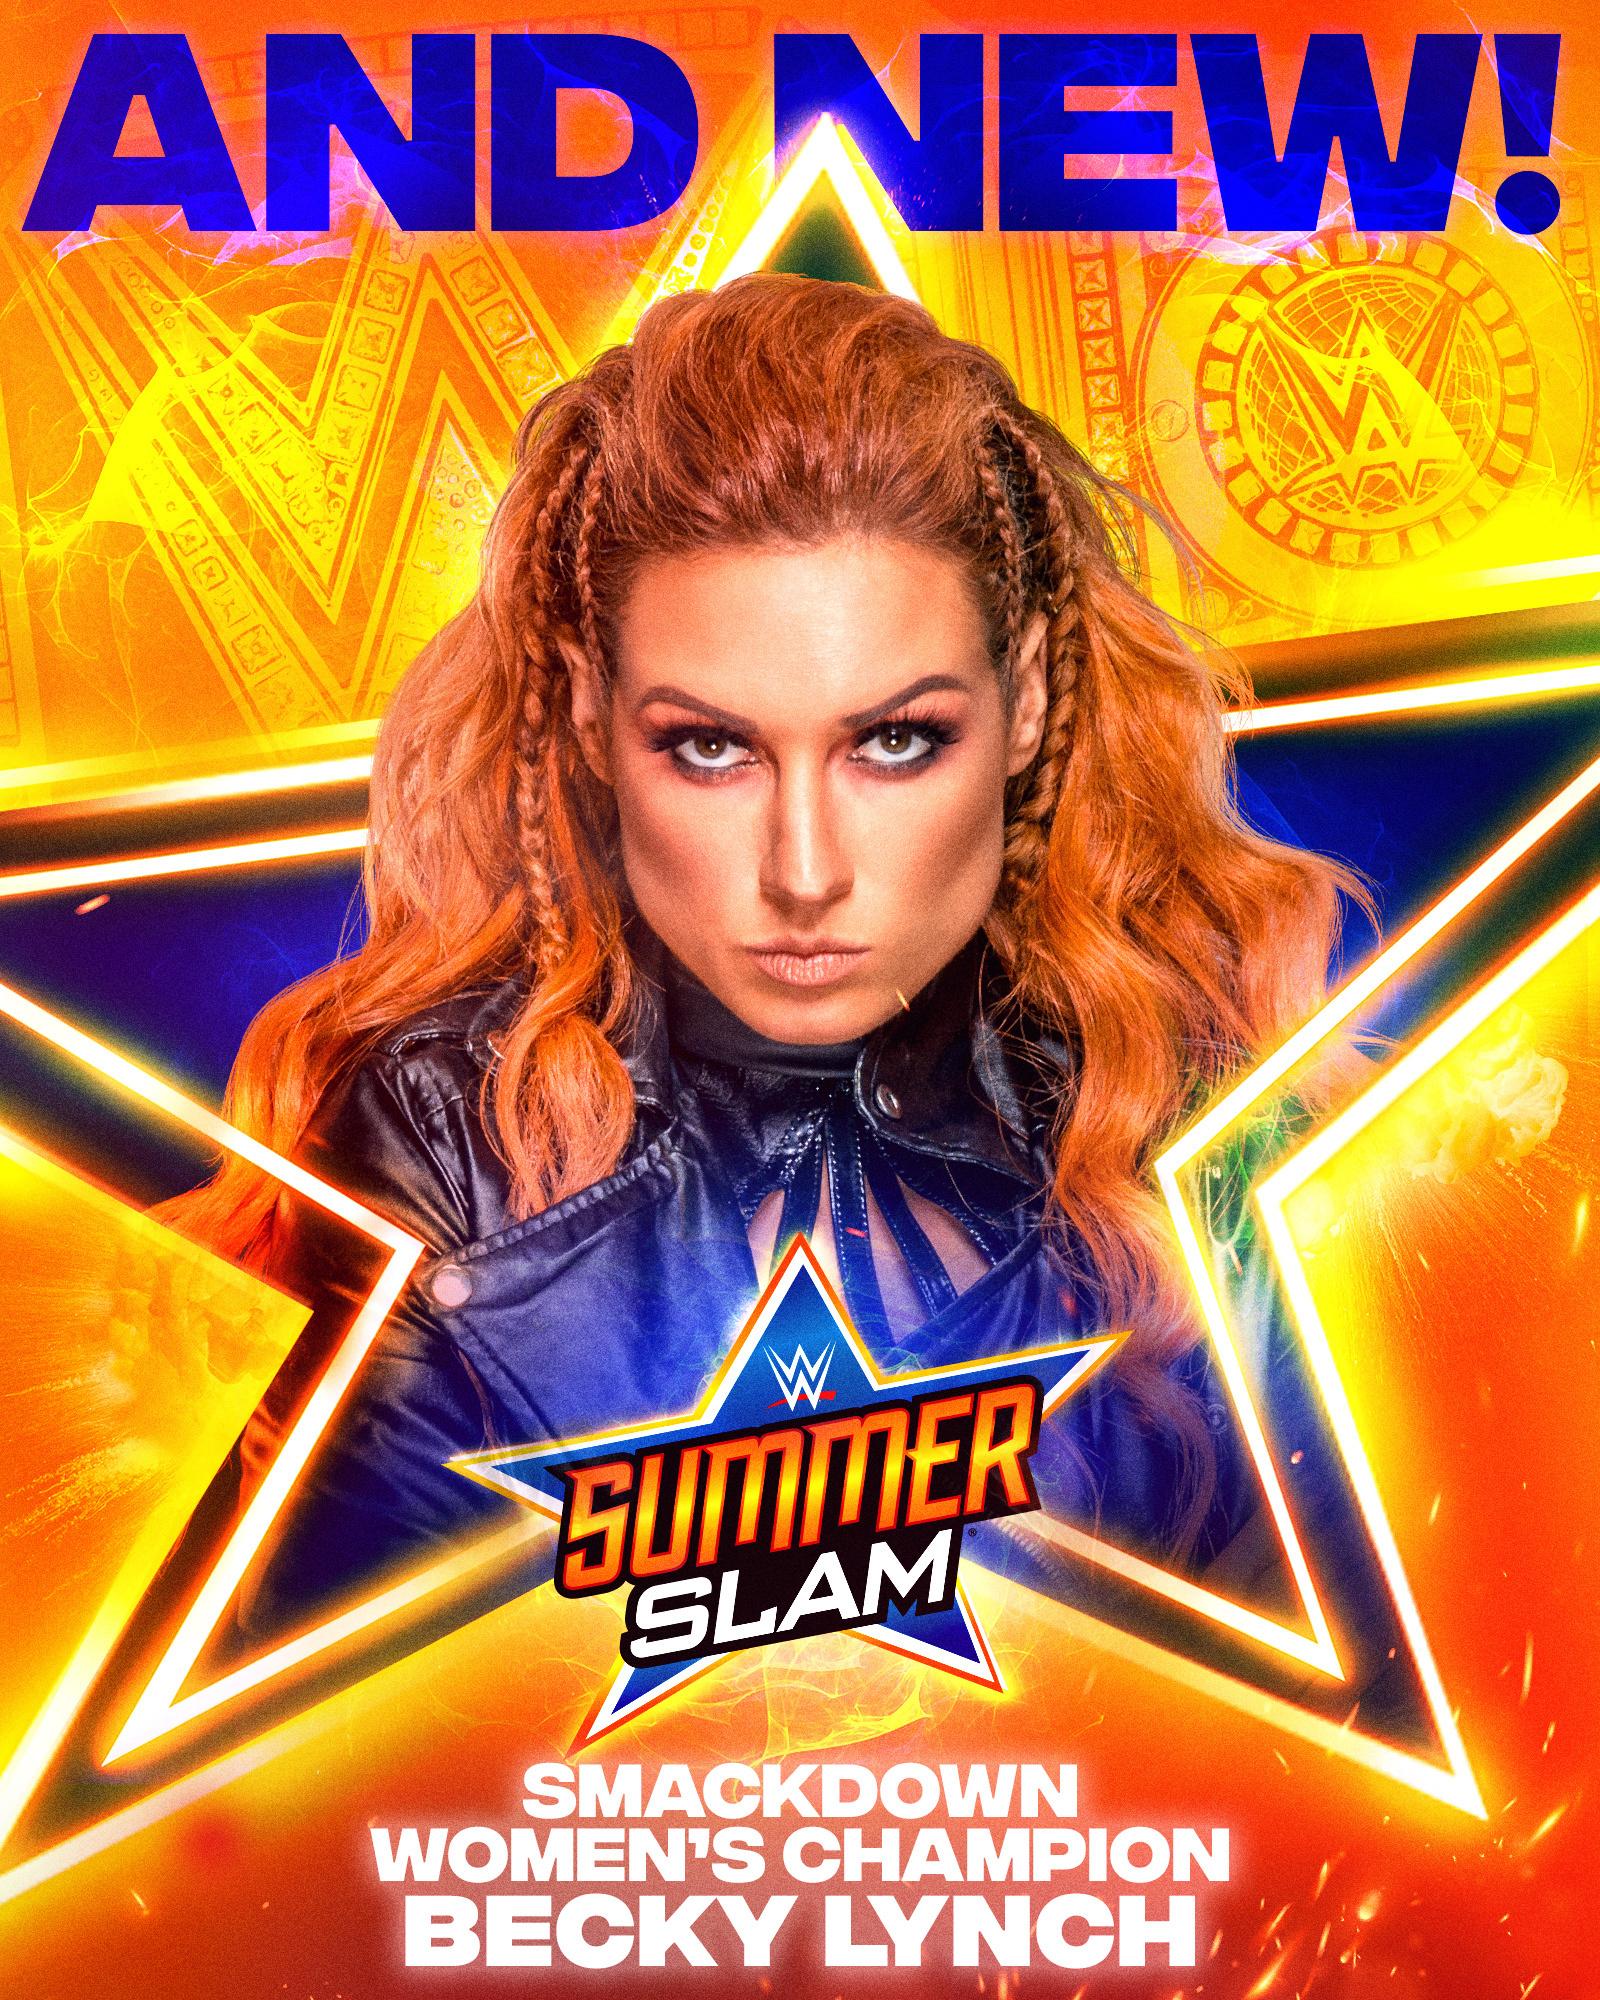 WWE Summerslam 2021: Becky Lynch Returns To Win Smackdown Women's Title 109